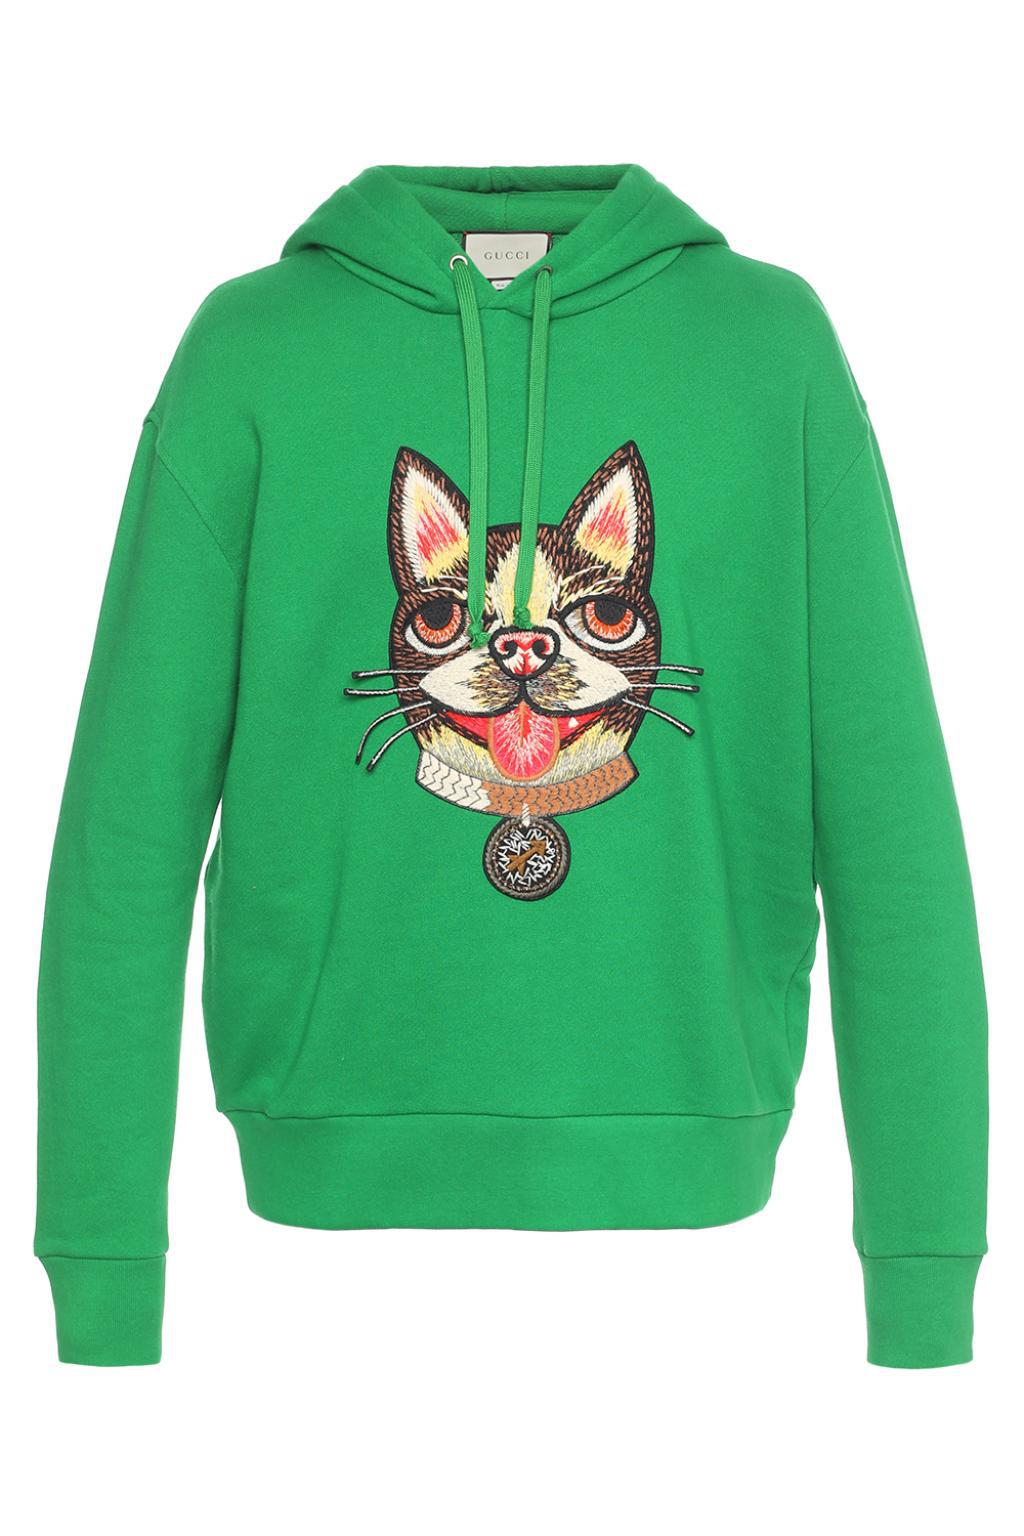 b3ac1153 Gucci Cat Head-sewn Sweatshirt in Green for Men - Lyst